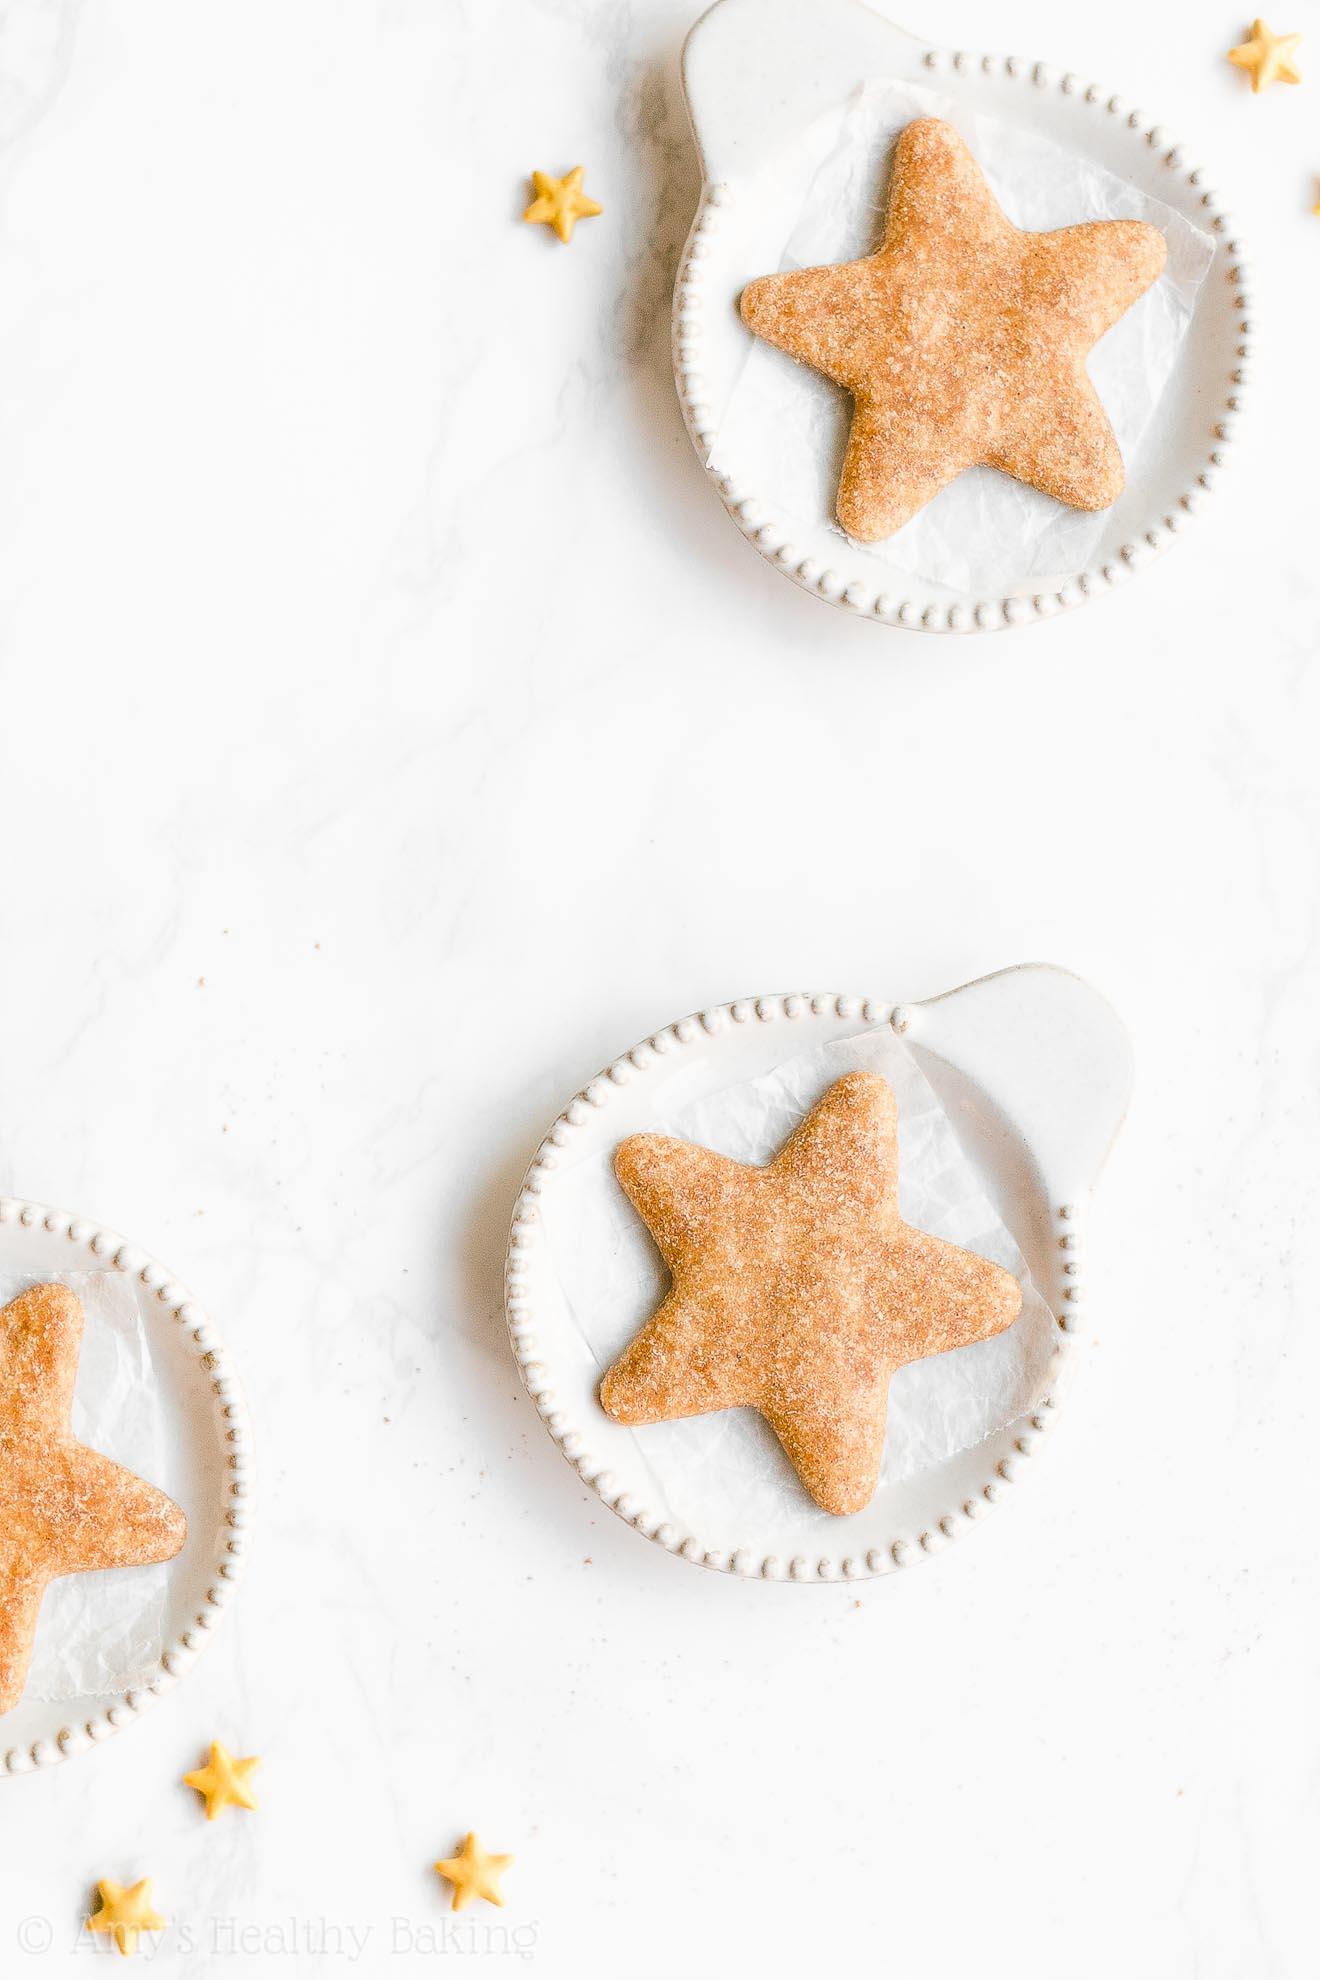 Easy Healthy Vegan Gluten Free Low Fat Eggnog Sugar Cookies